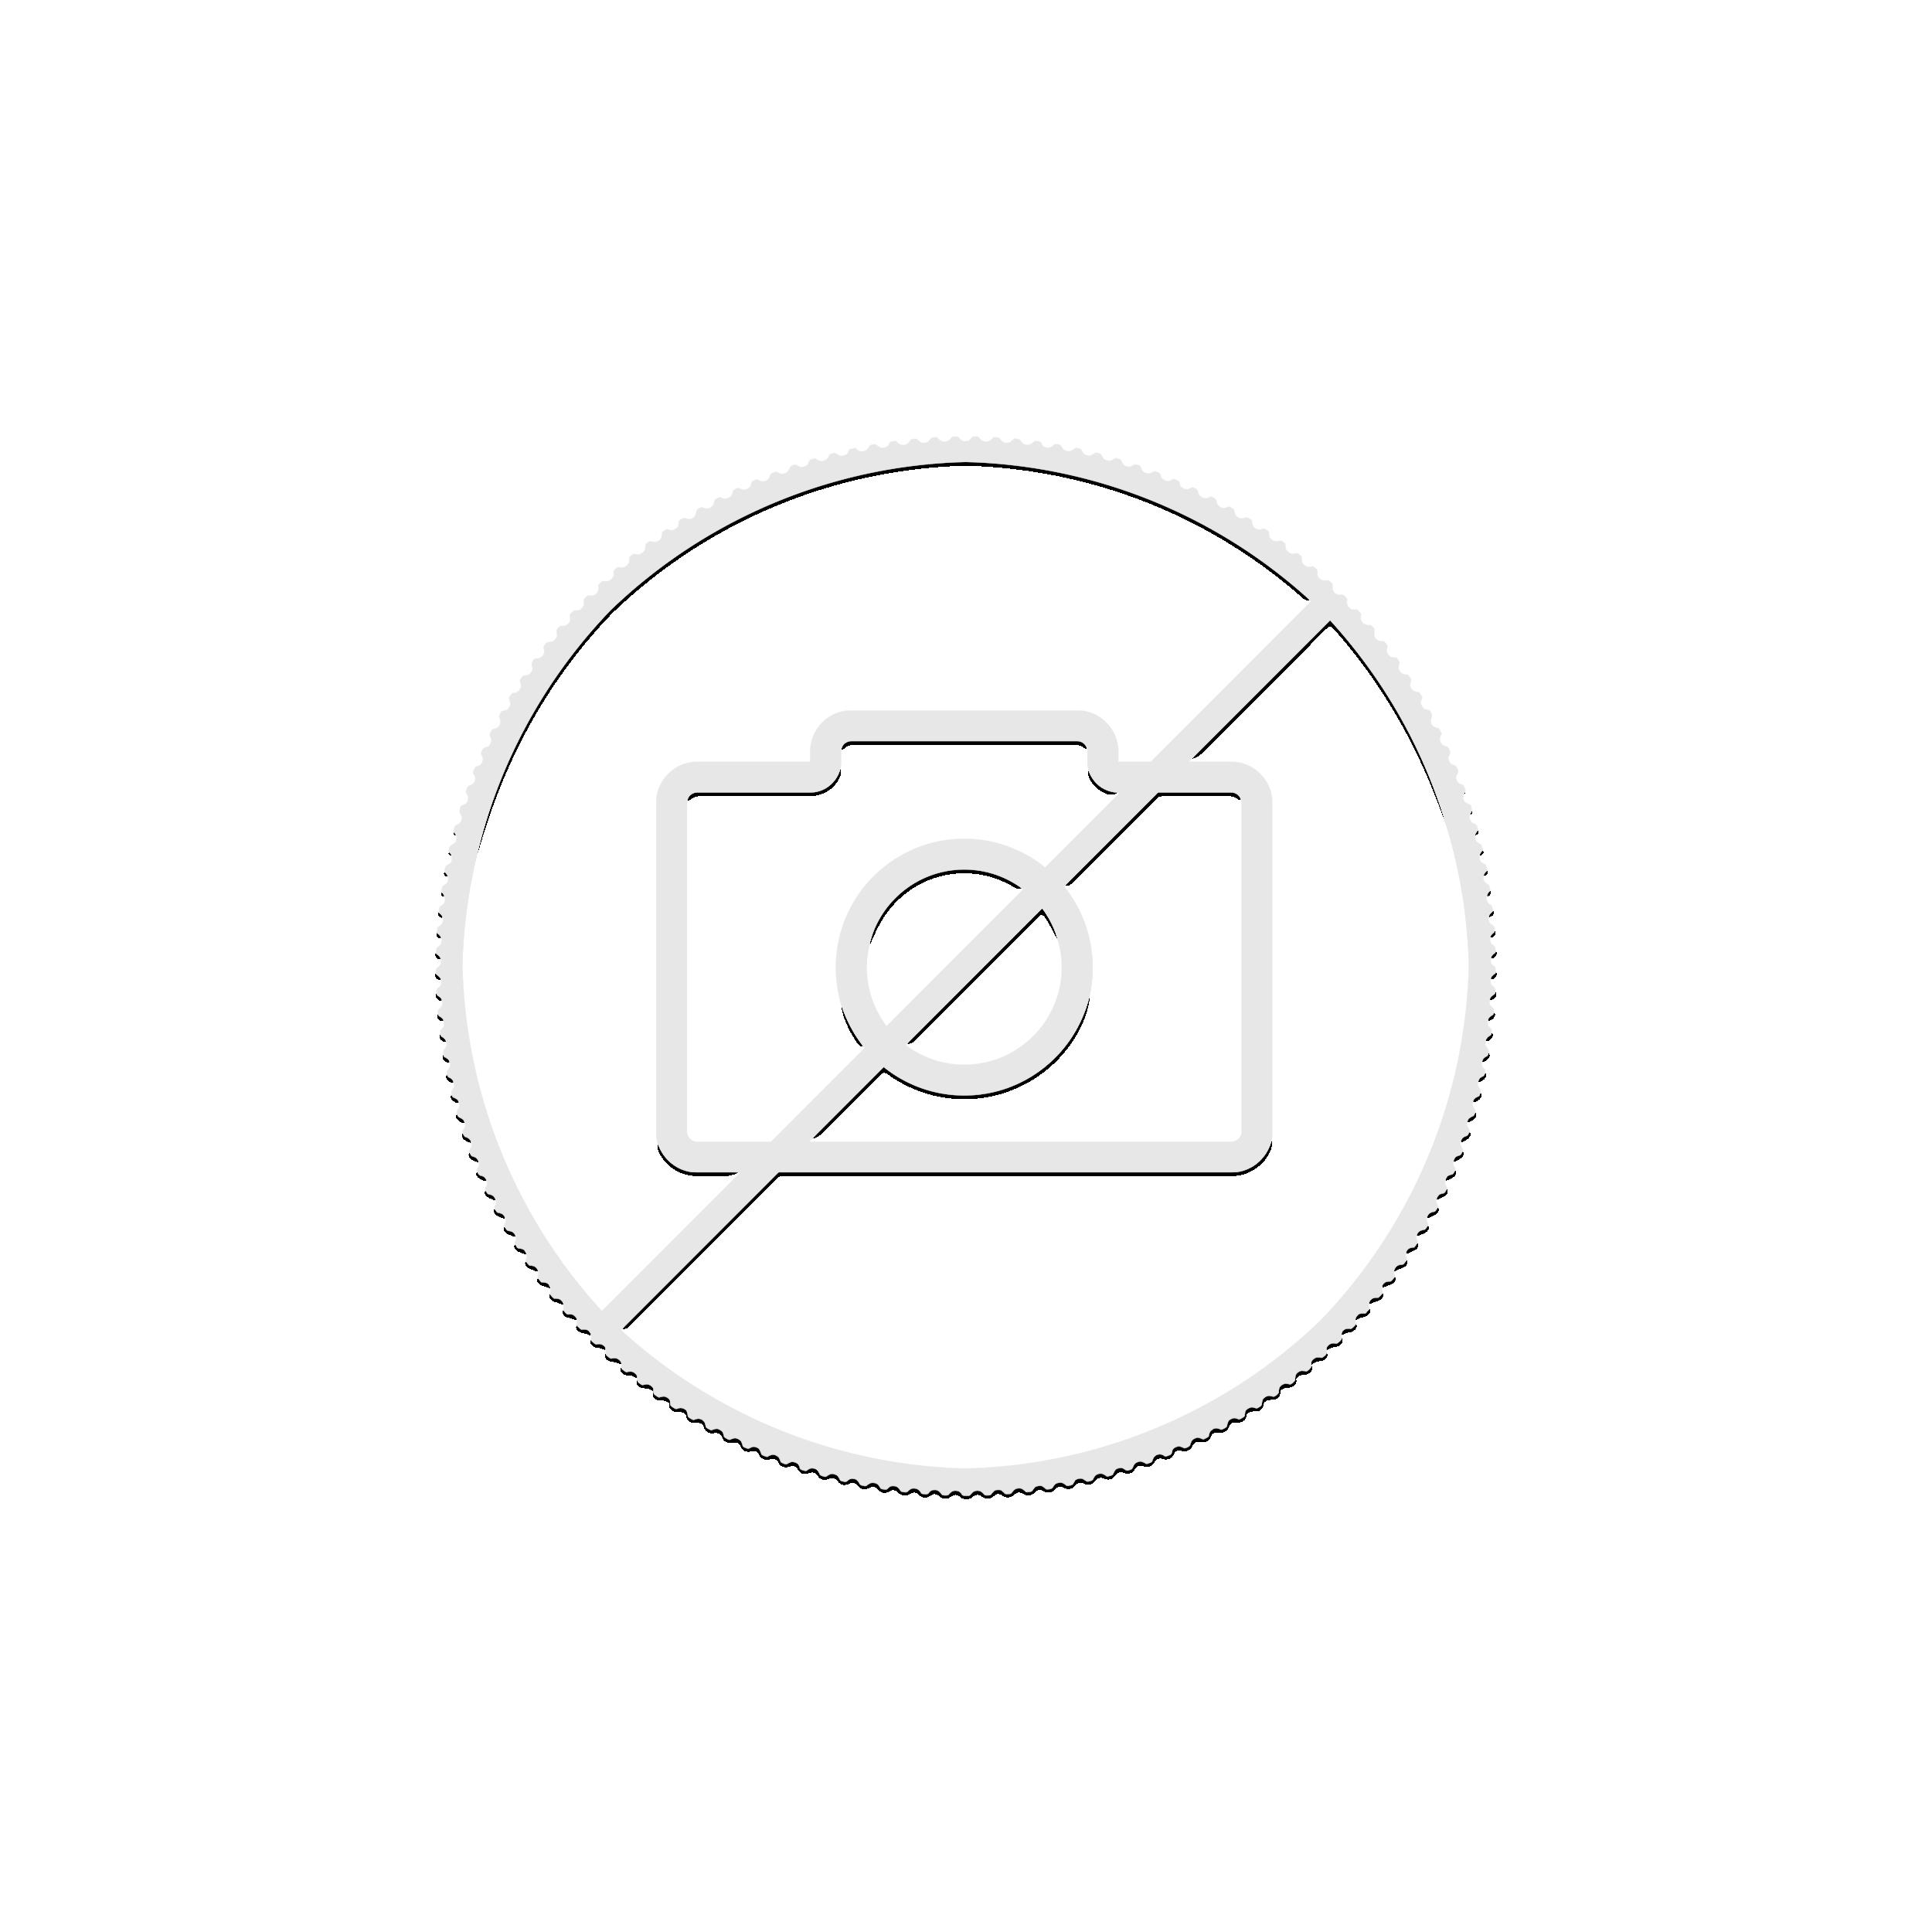 1 Troy ounce zilveren munt Golden Ring serie - Robin Hood 21 reverse